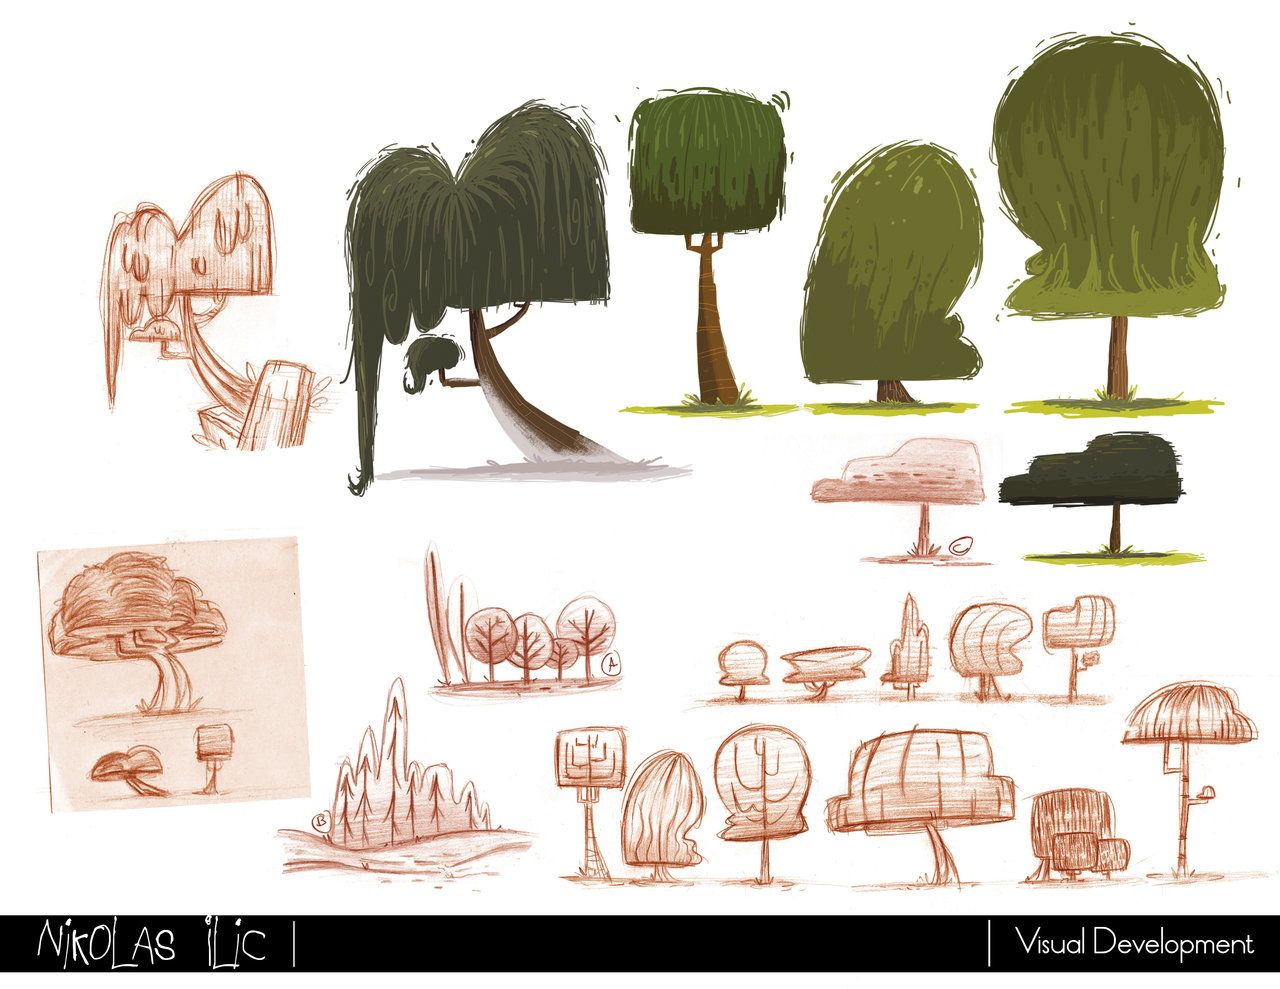 Character Design Visual Development : Nikolas ilic designer visual development artist